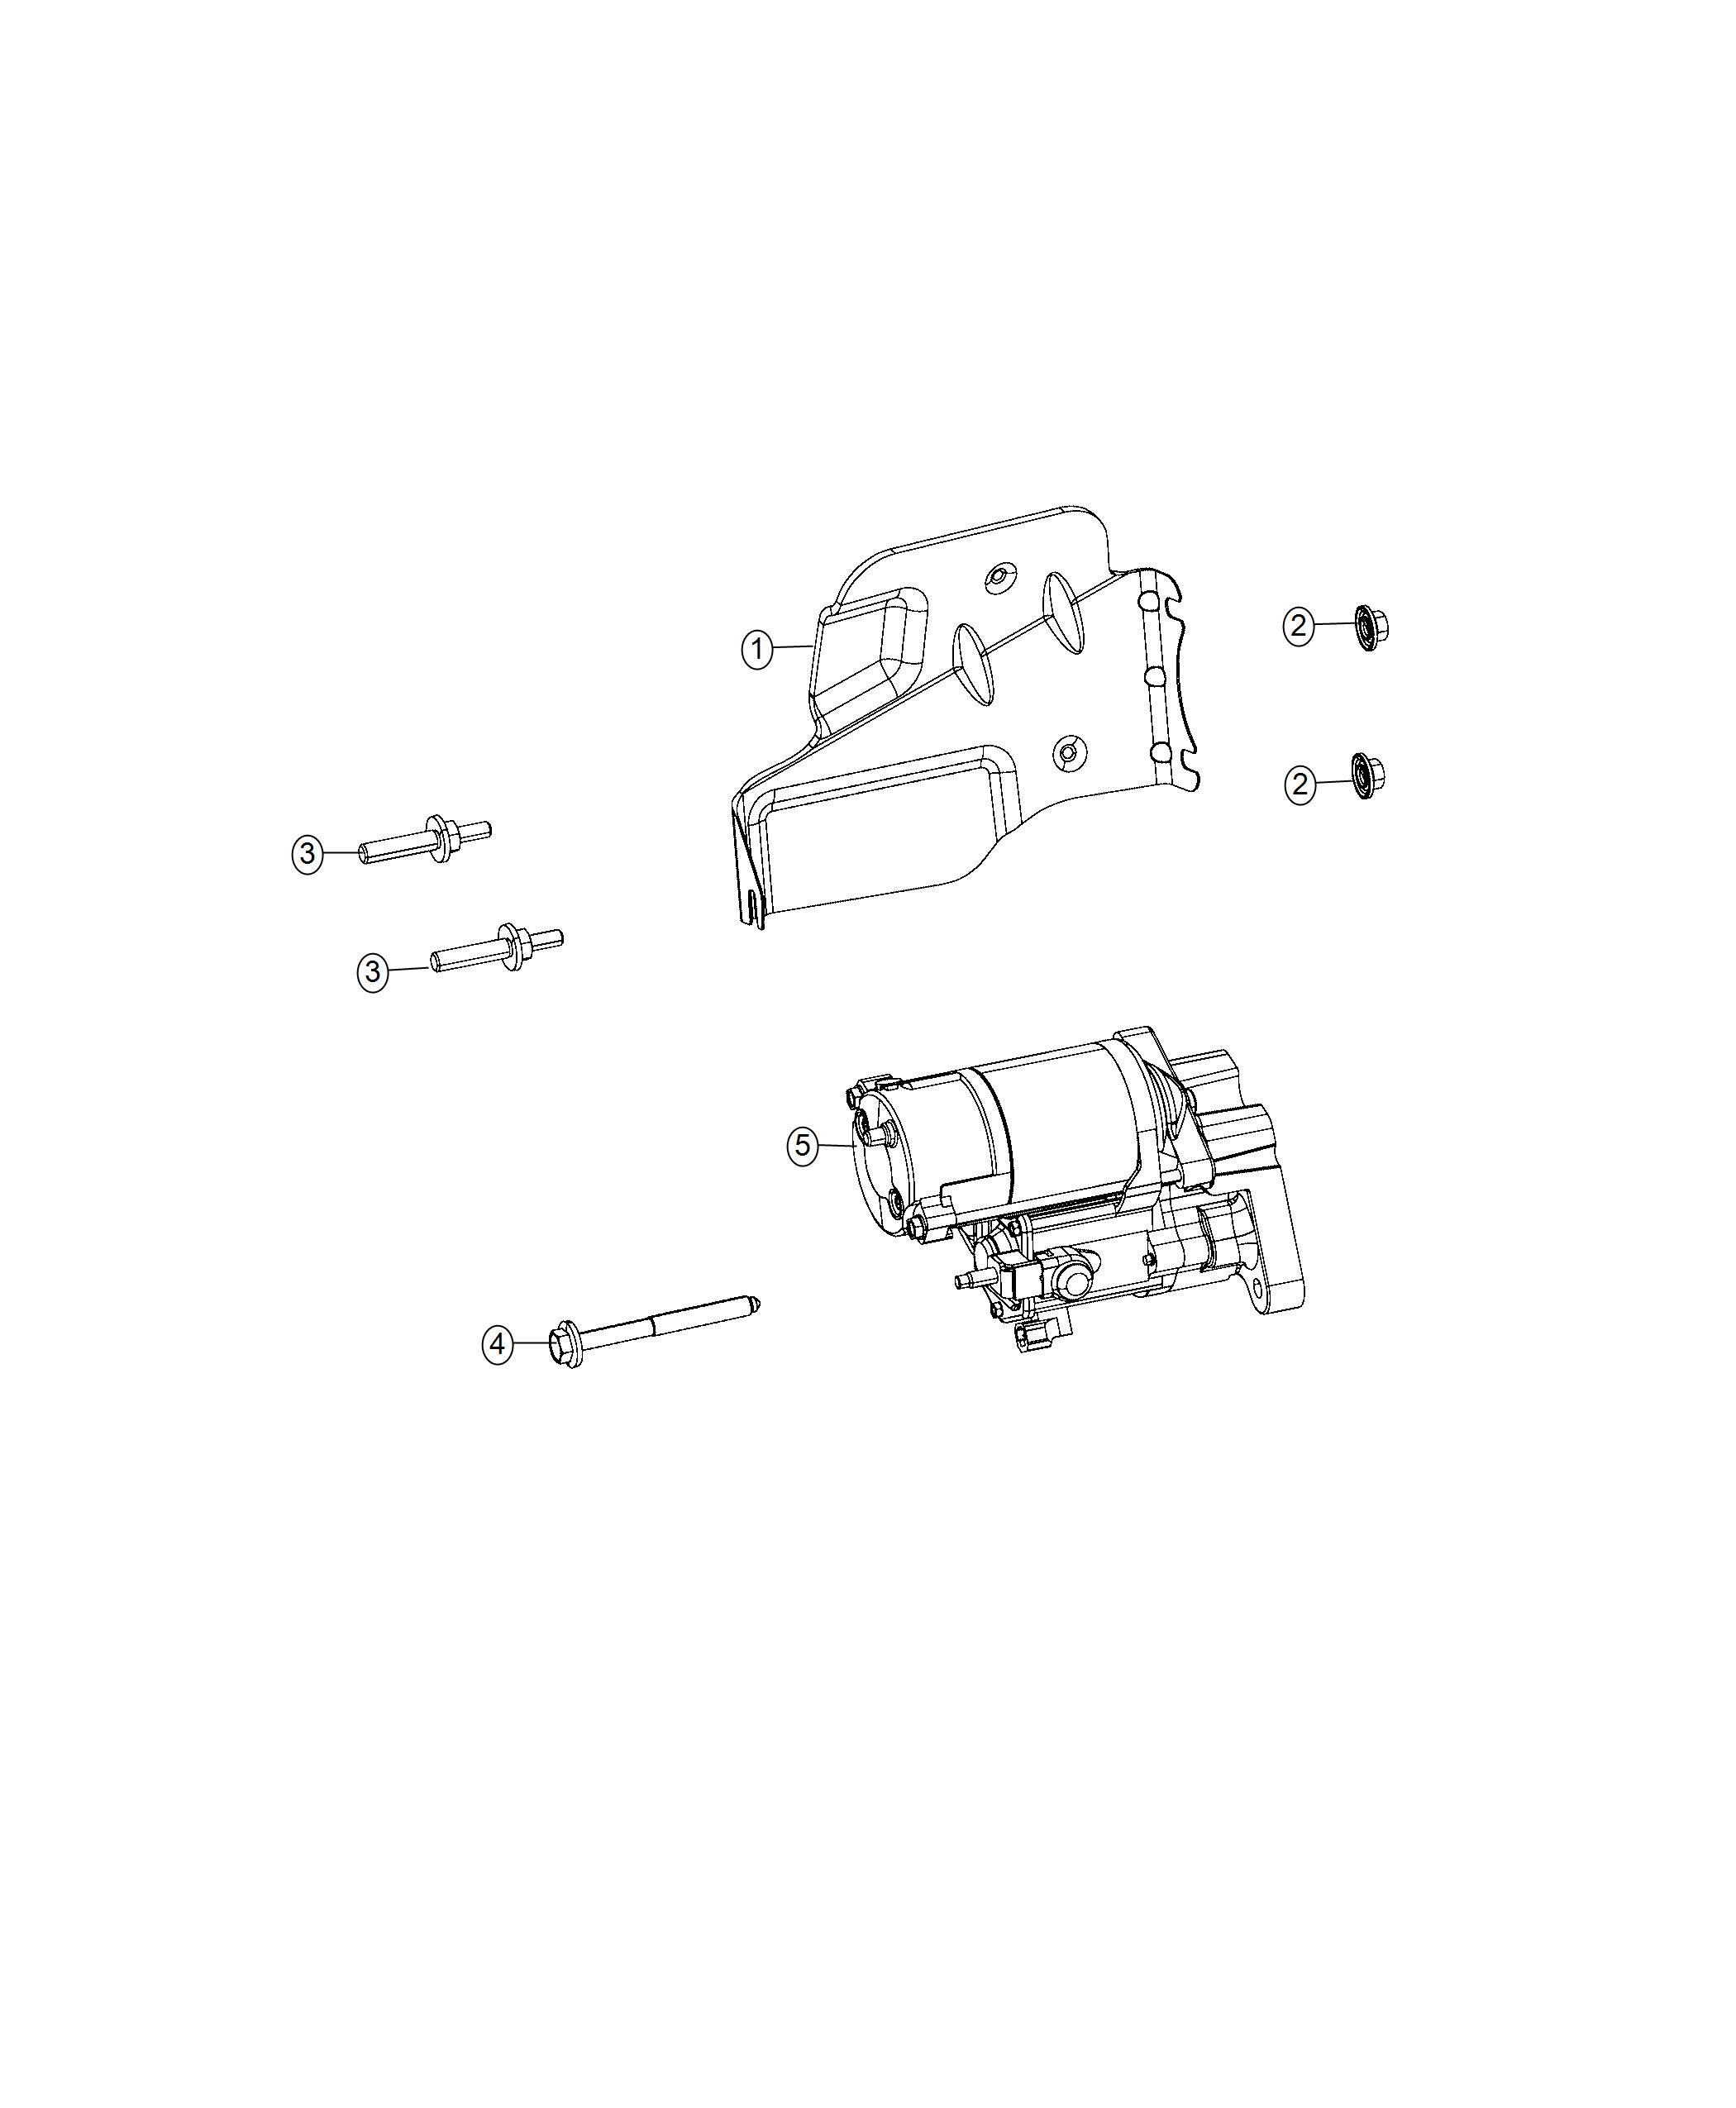 Dodge Challenger Shield Heat Related Starter